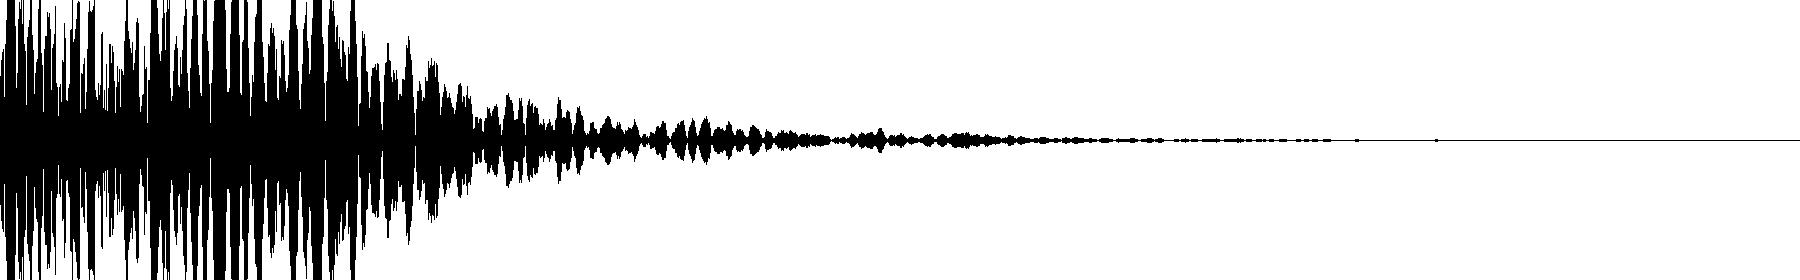 perc 0